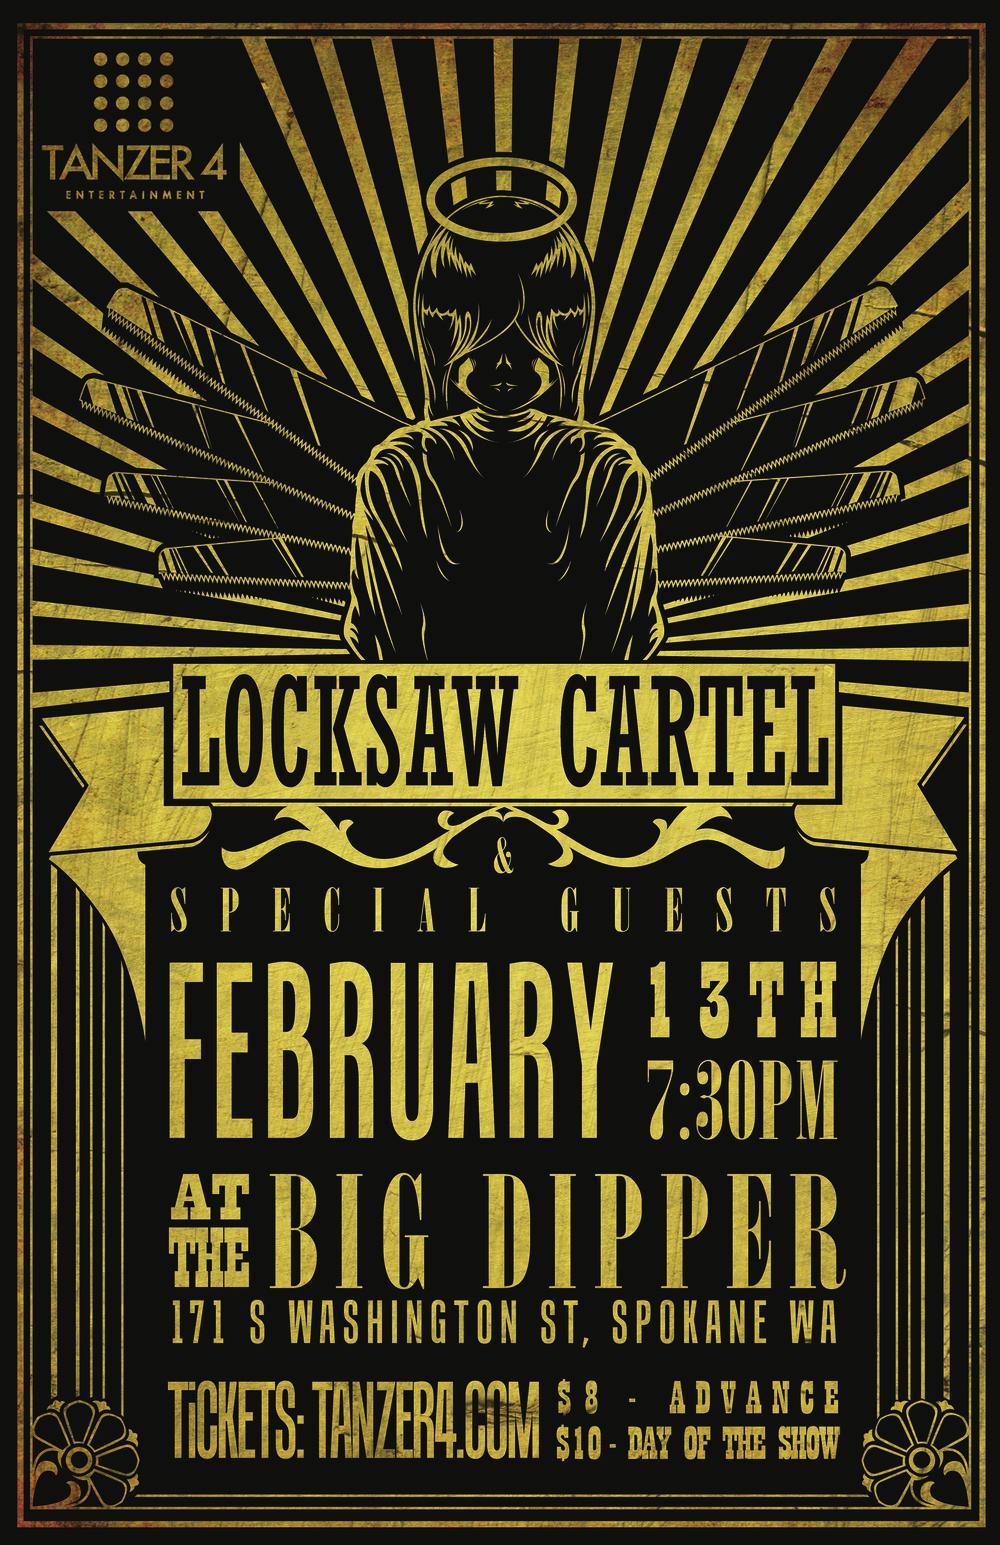 Locksaw cartel Poster.jpg